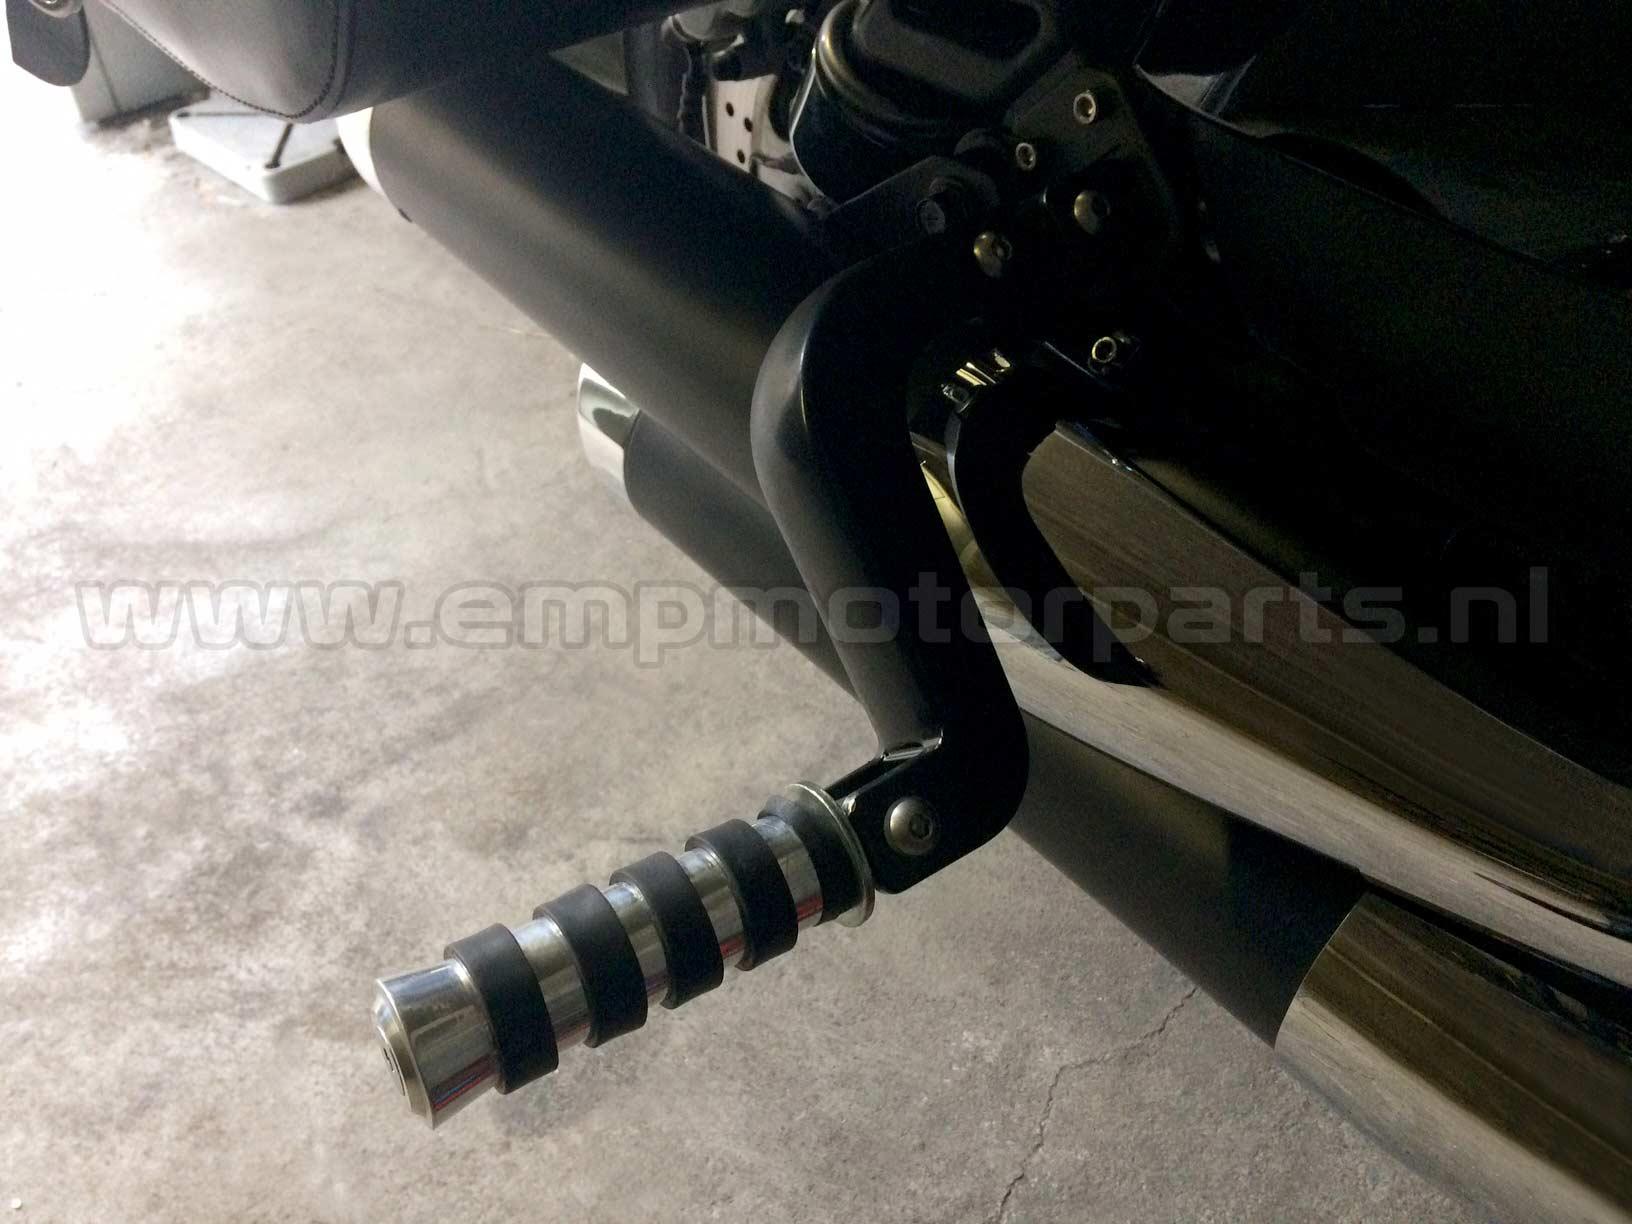 Footpeg lowering set (black coated) Kawasaki (2)